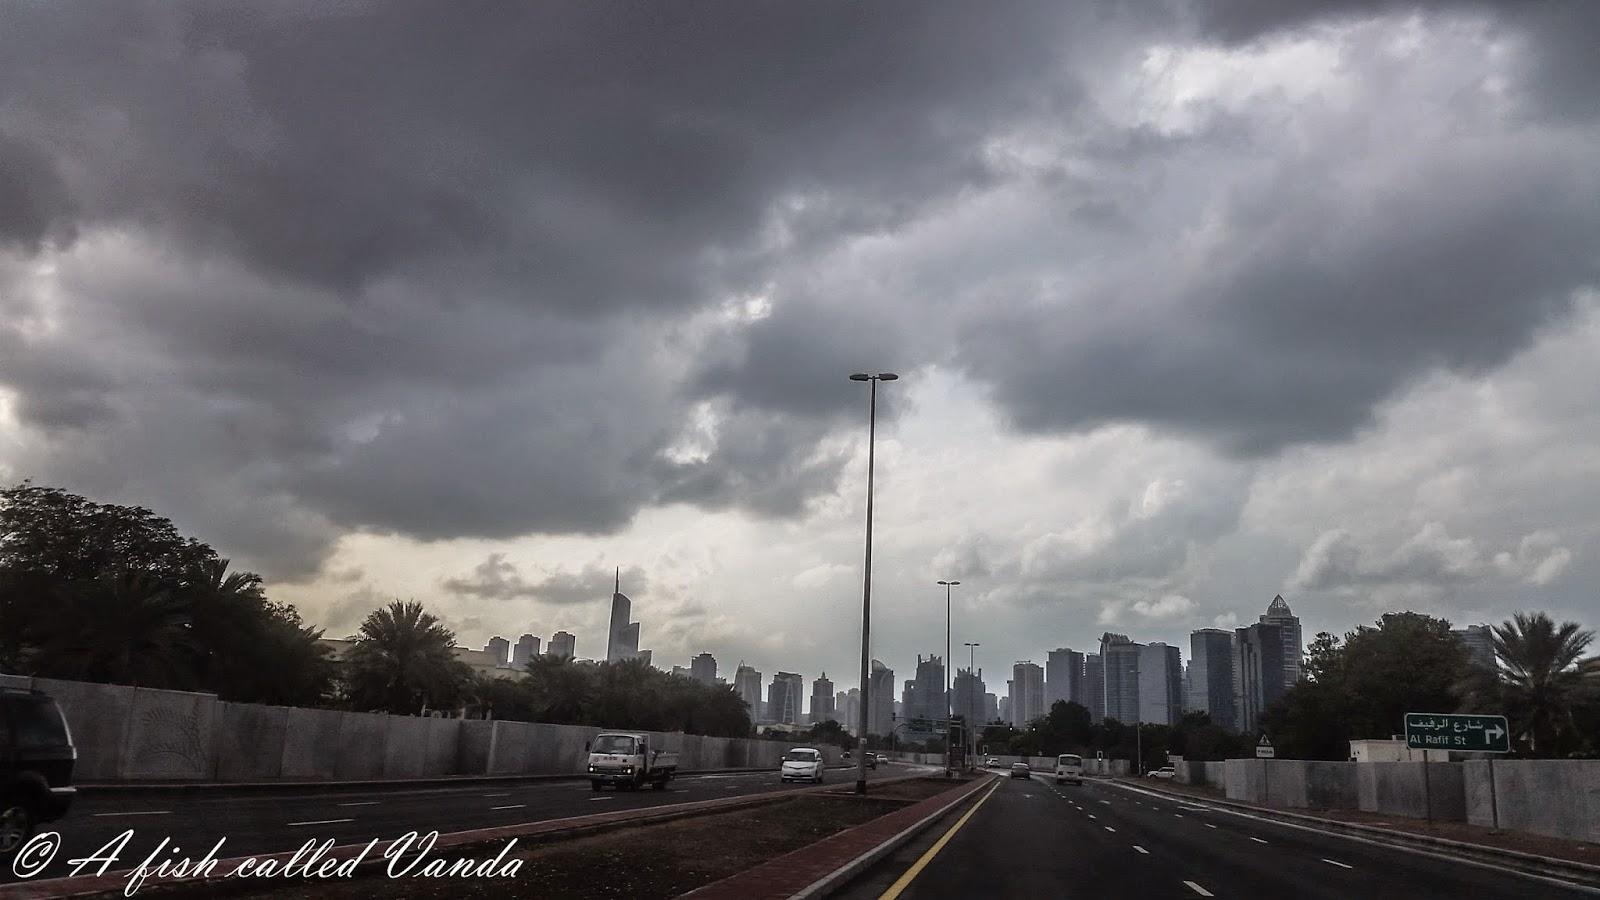 Dubaj w chmurach, #Dubaj, pogoda w Dubaju